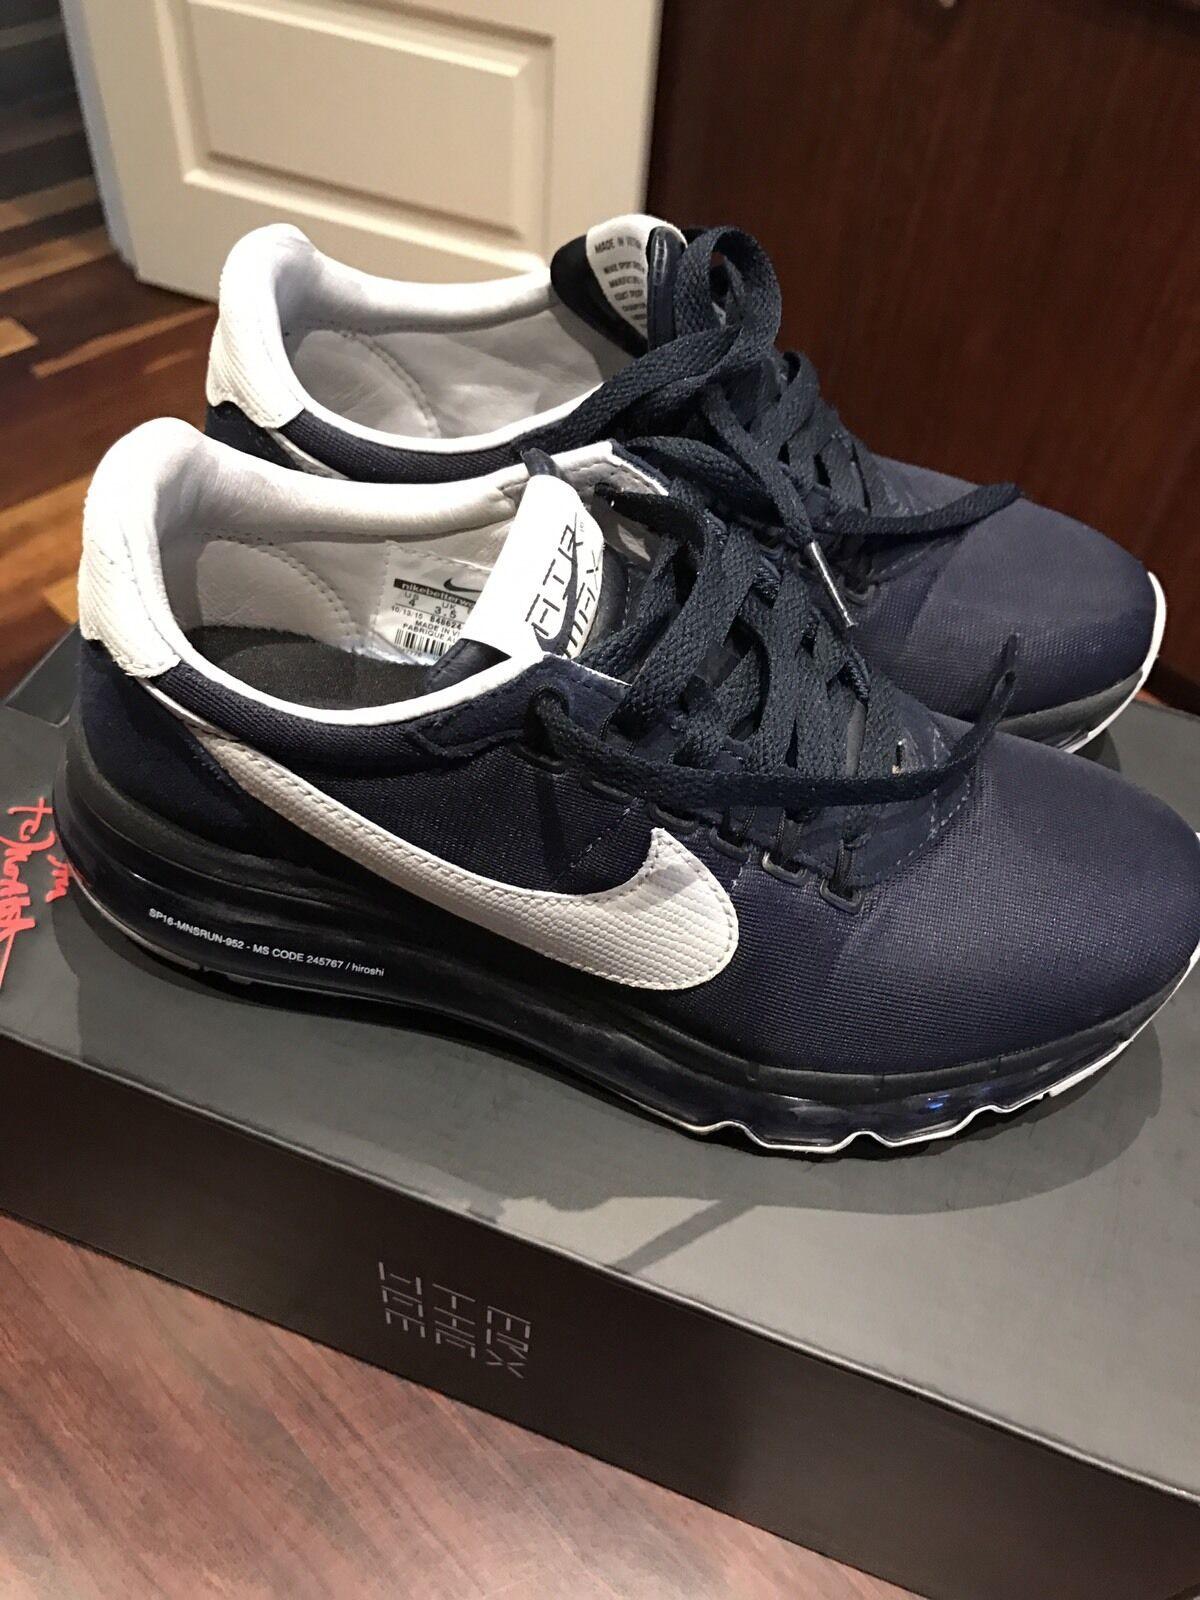 Nike Air Max LD Zero 2018 size us 4 HTM Cheap and beautiful fashion